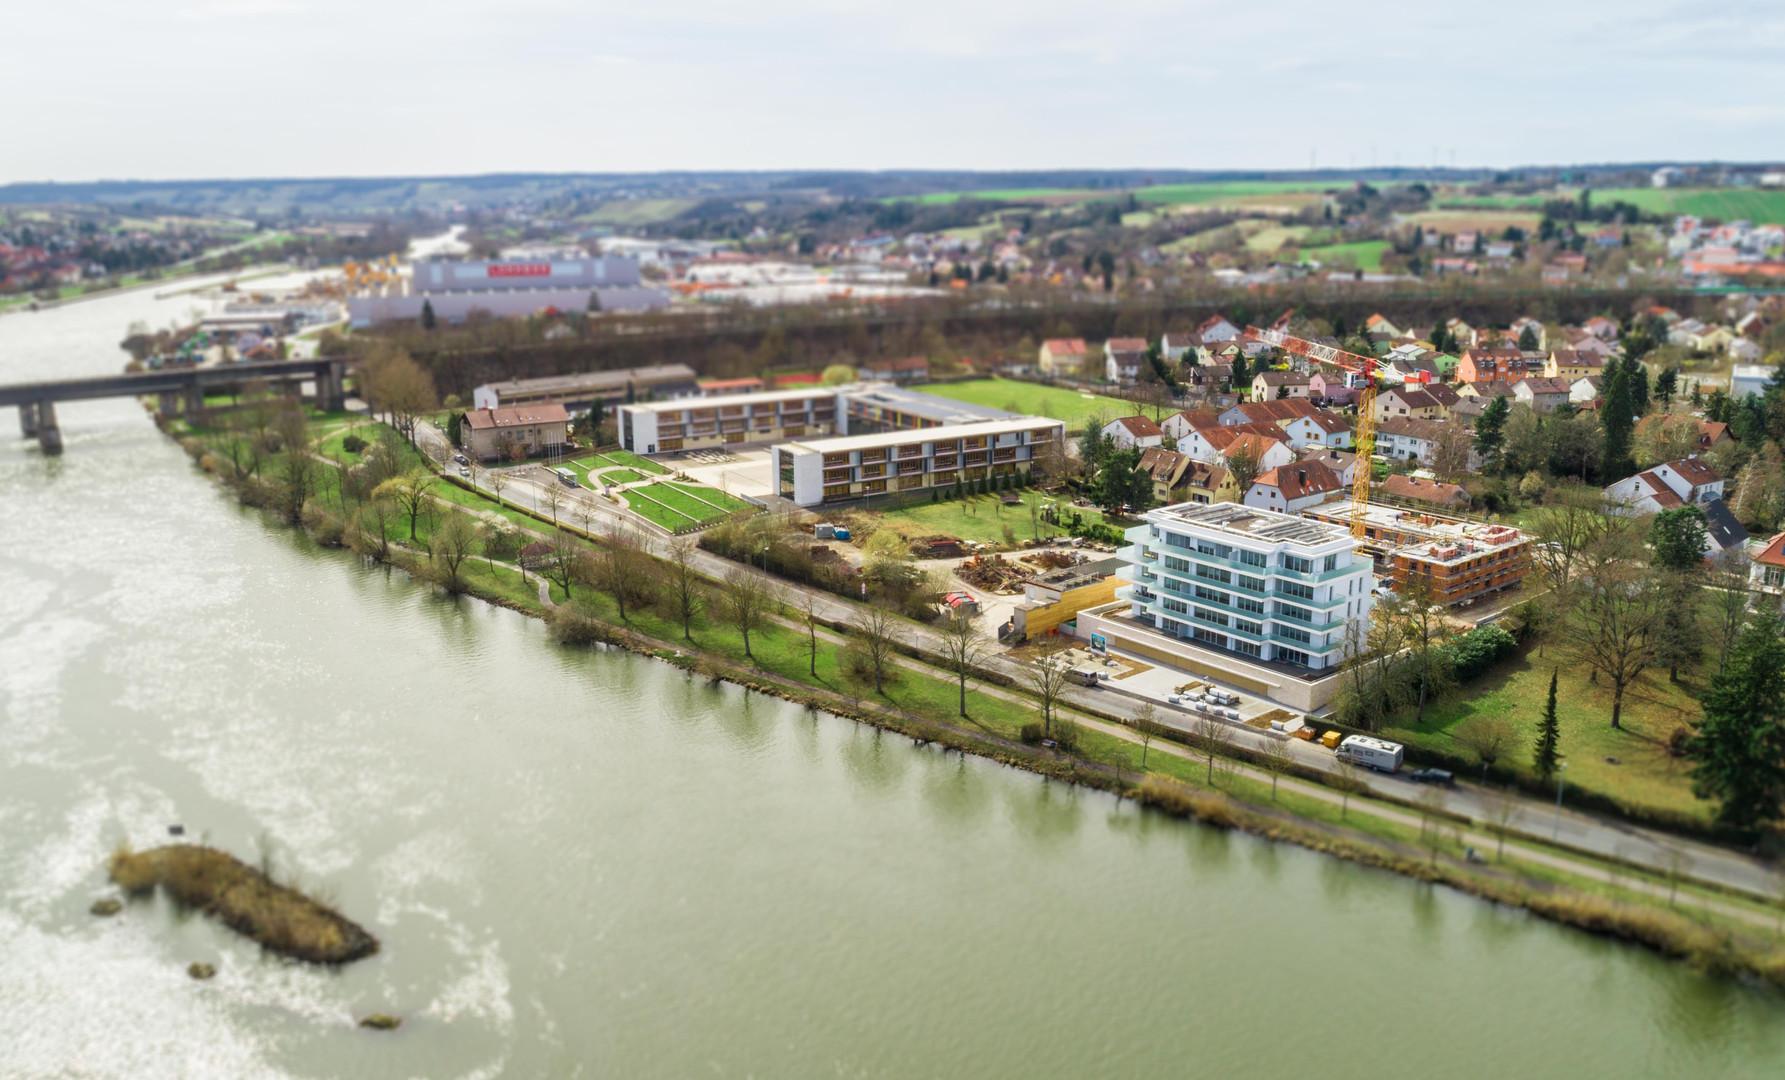 Maingold-Projekt direkt am Main in Kitzingen